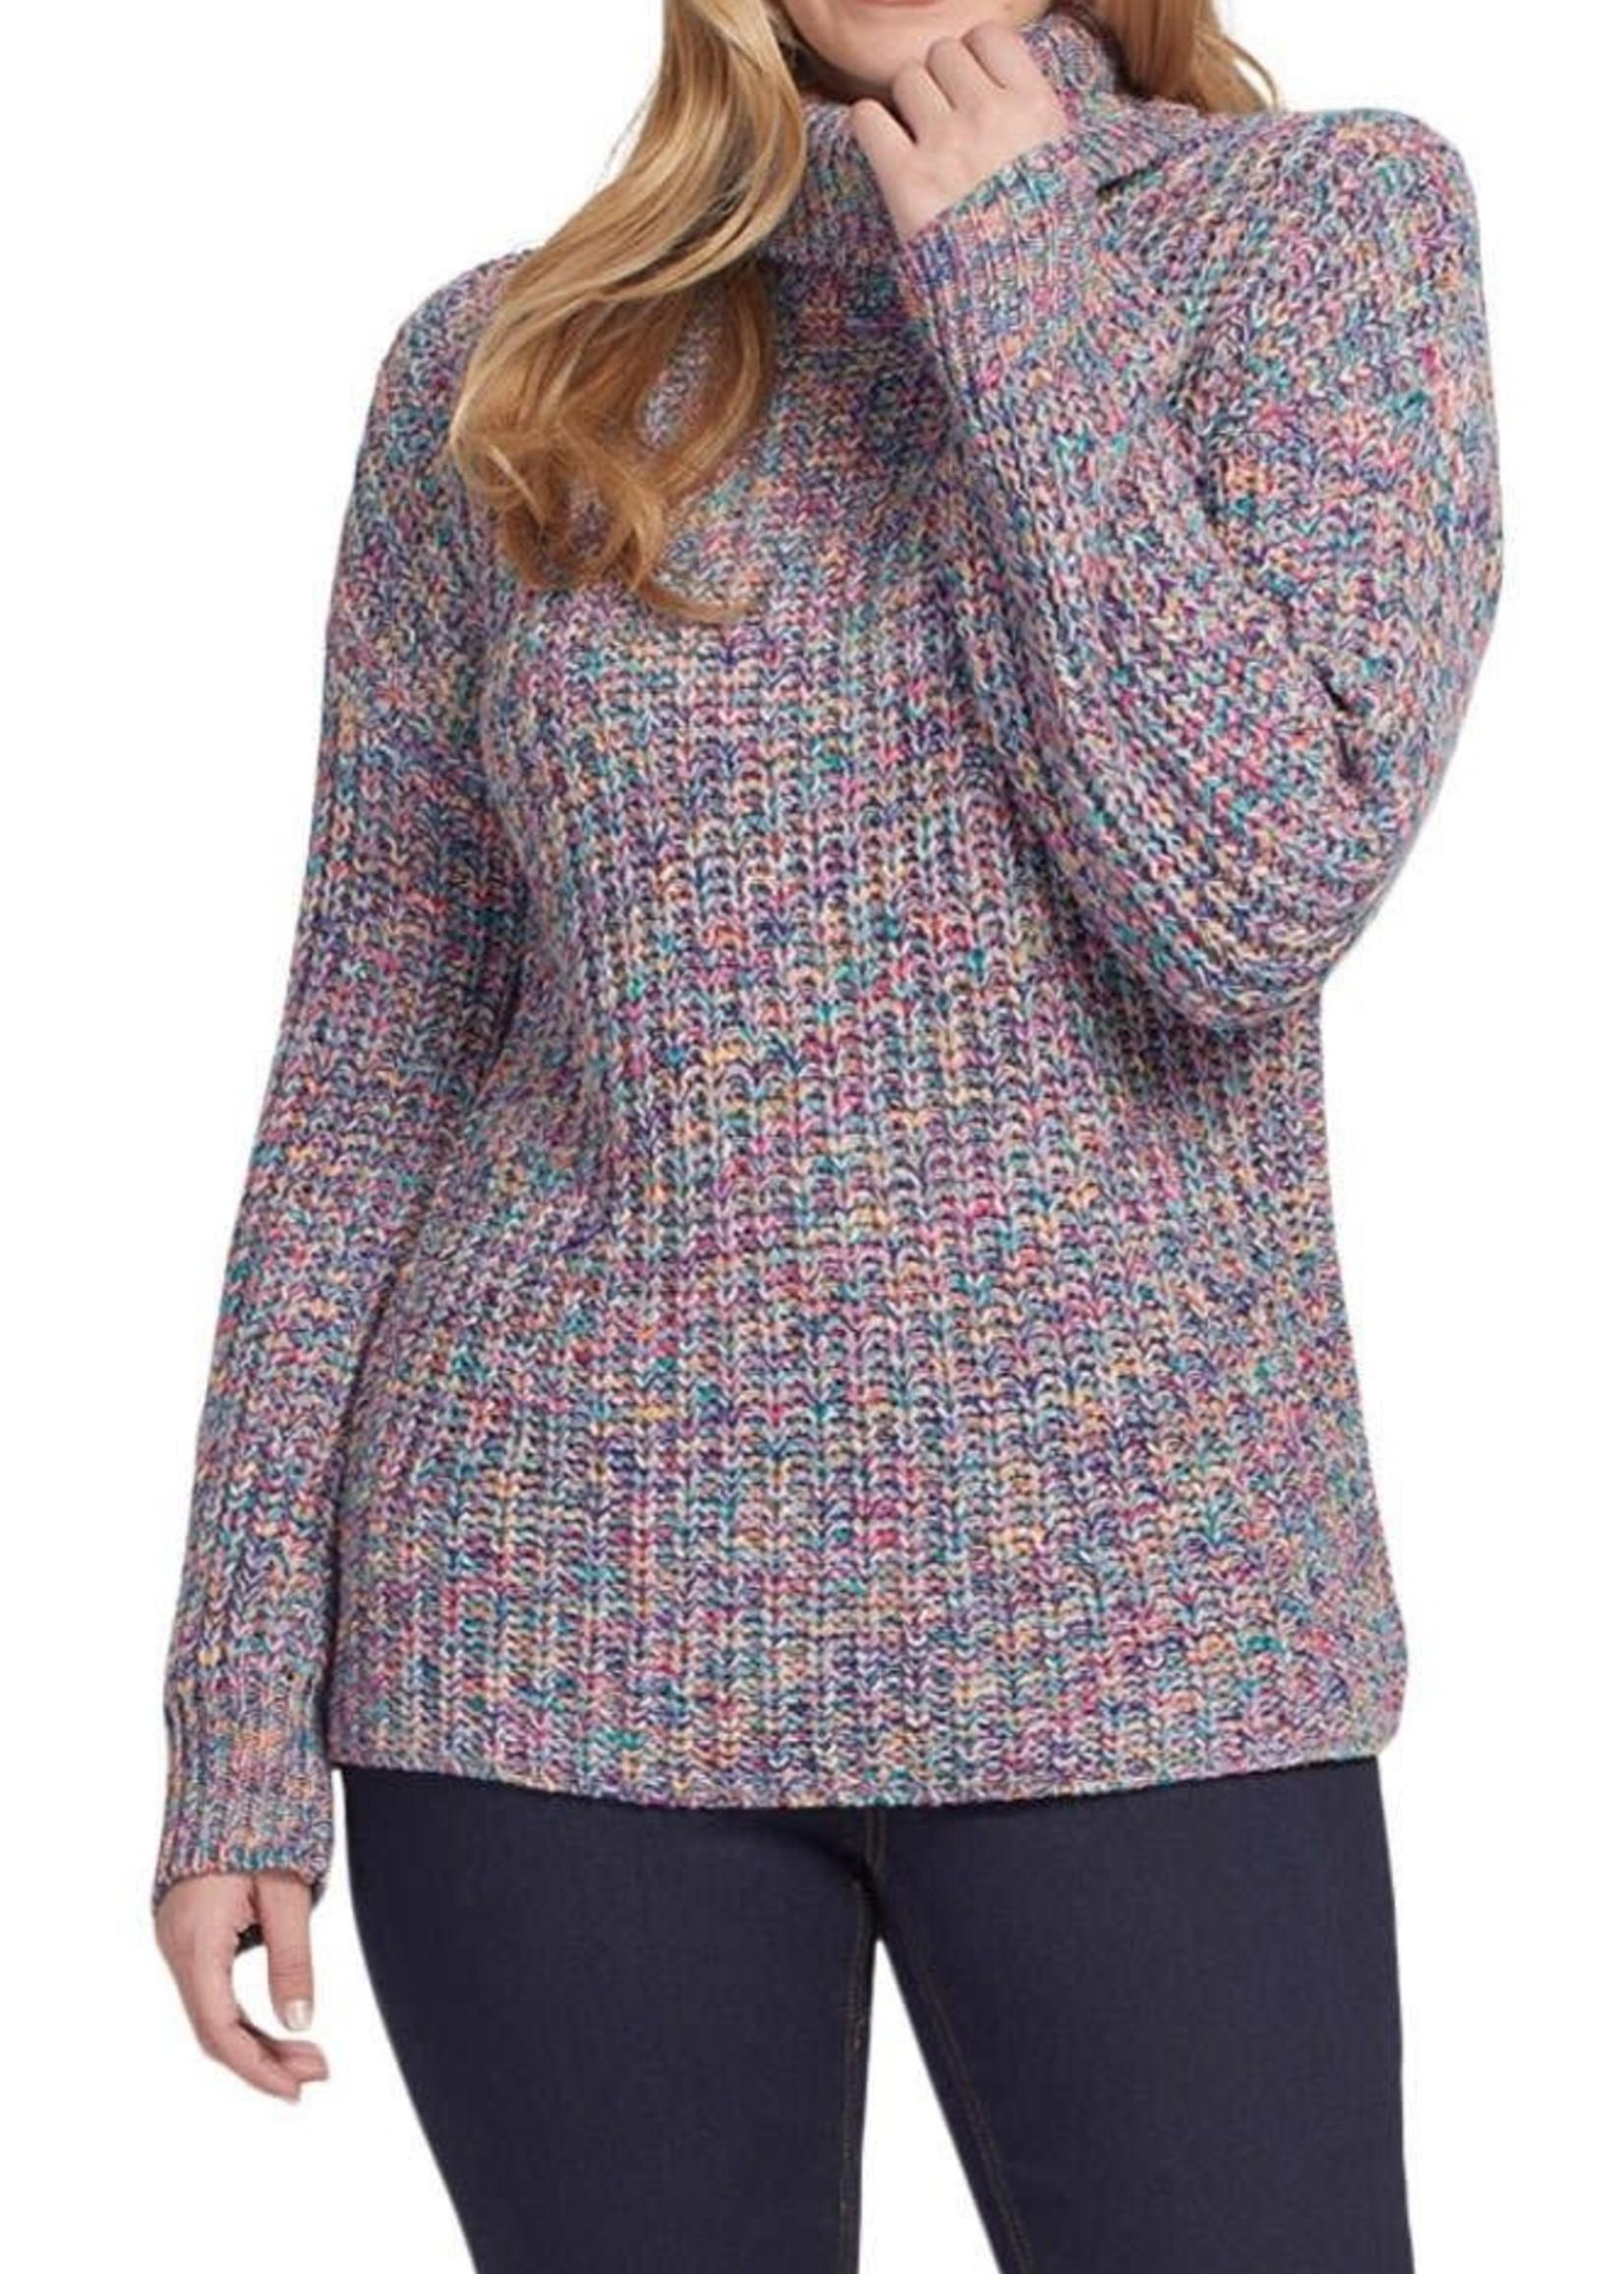 Tribal Tribal L/S Turtleneck Sweater